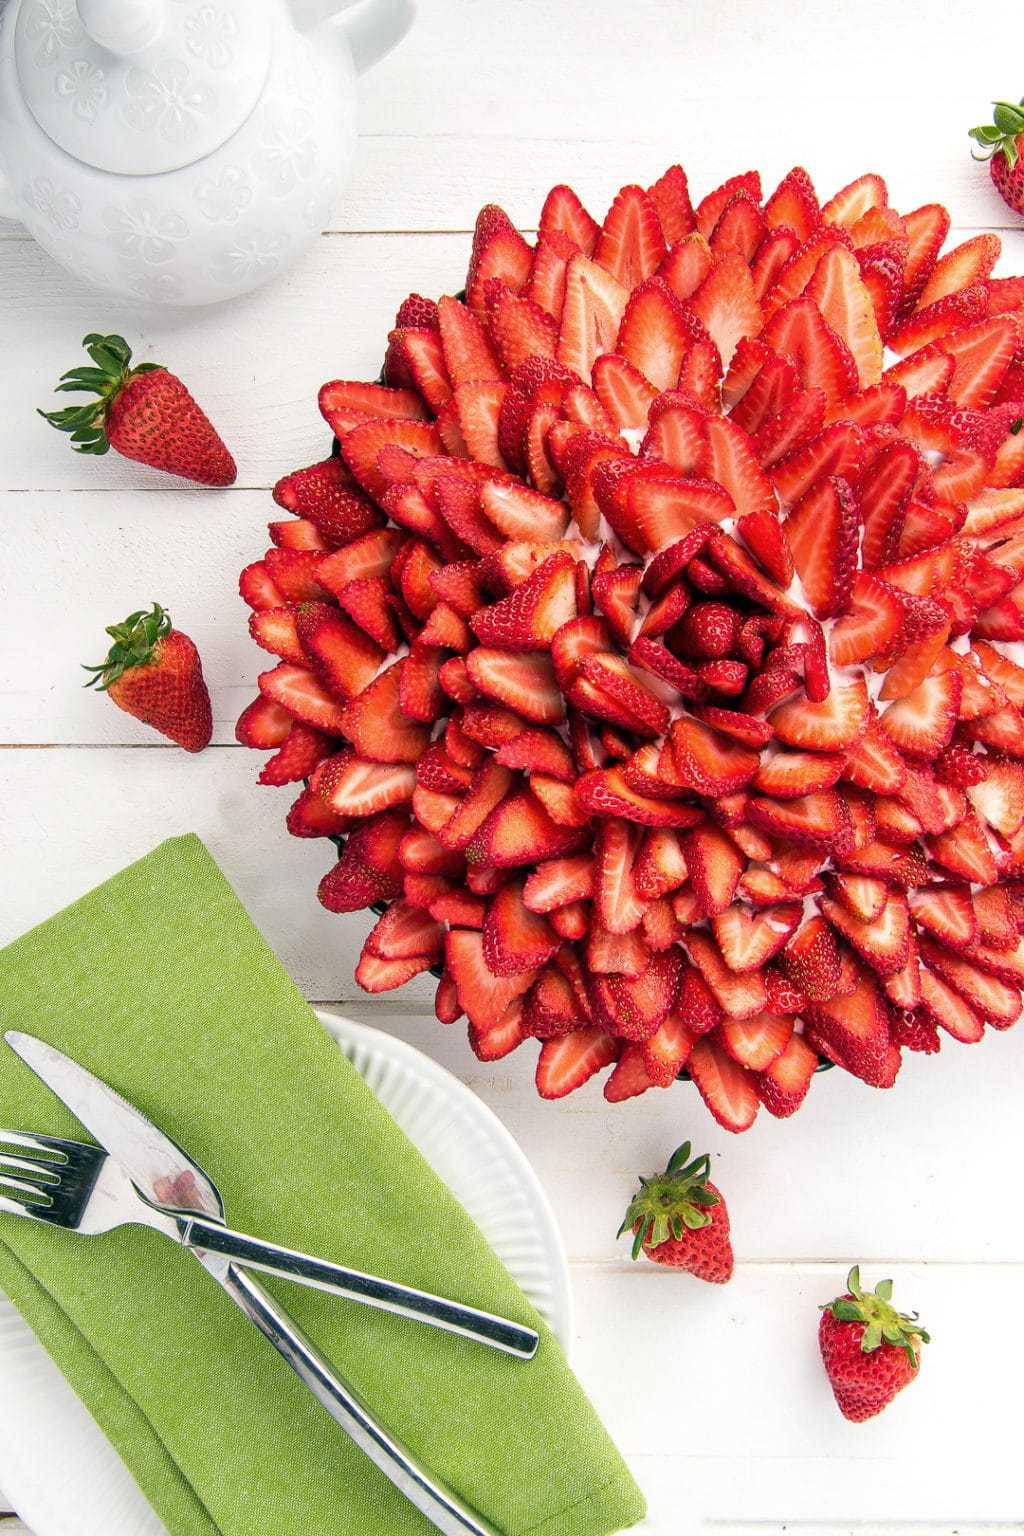 Strawberry Cream Pie with Coconut Cookie Shortbread Crust